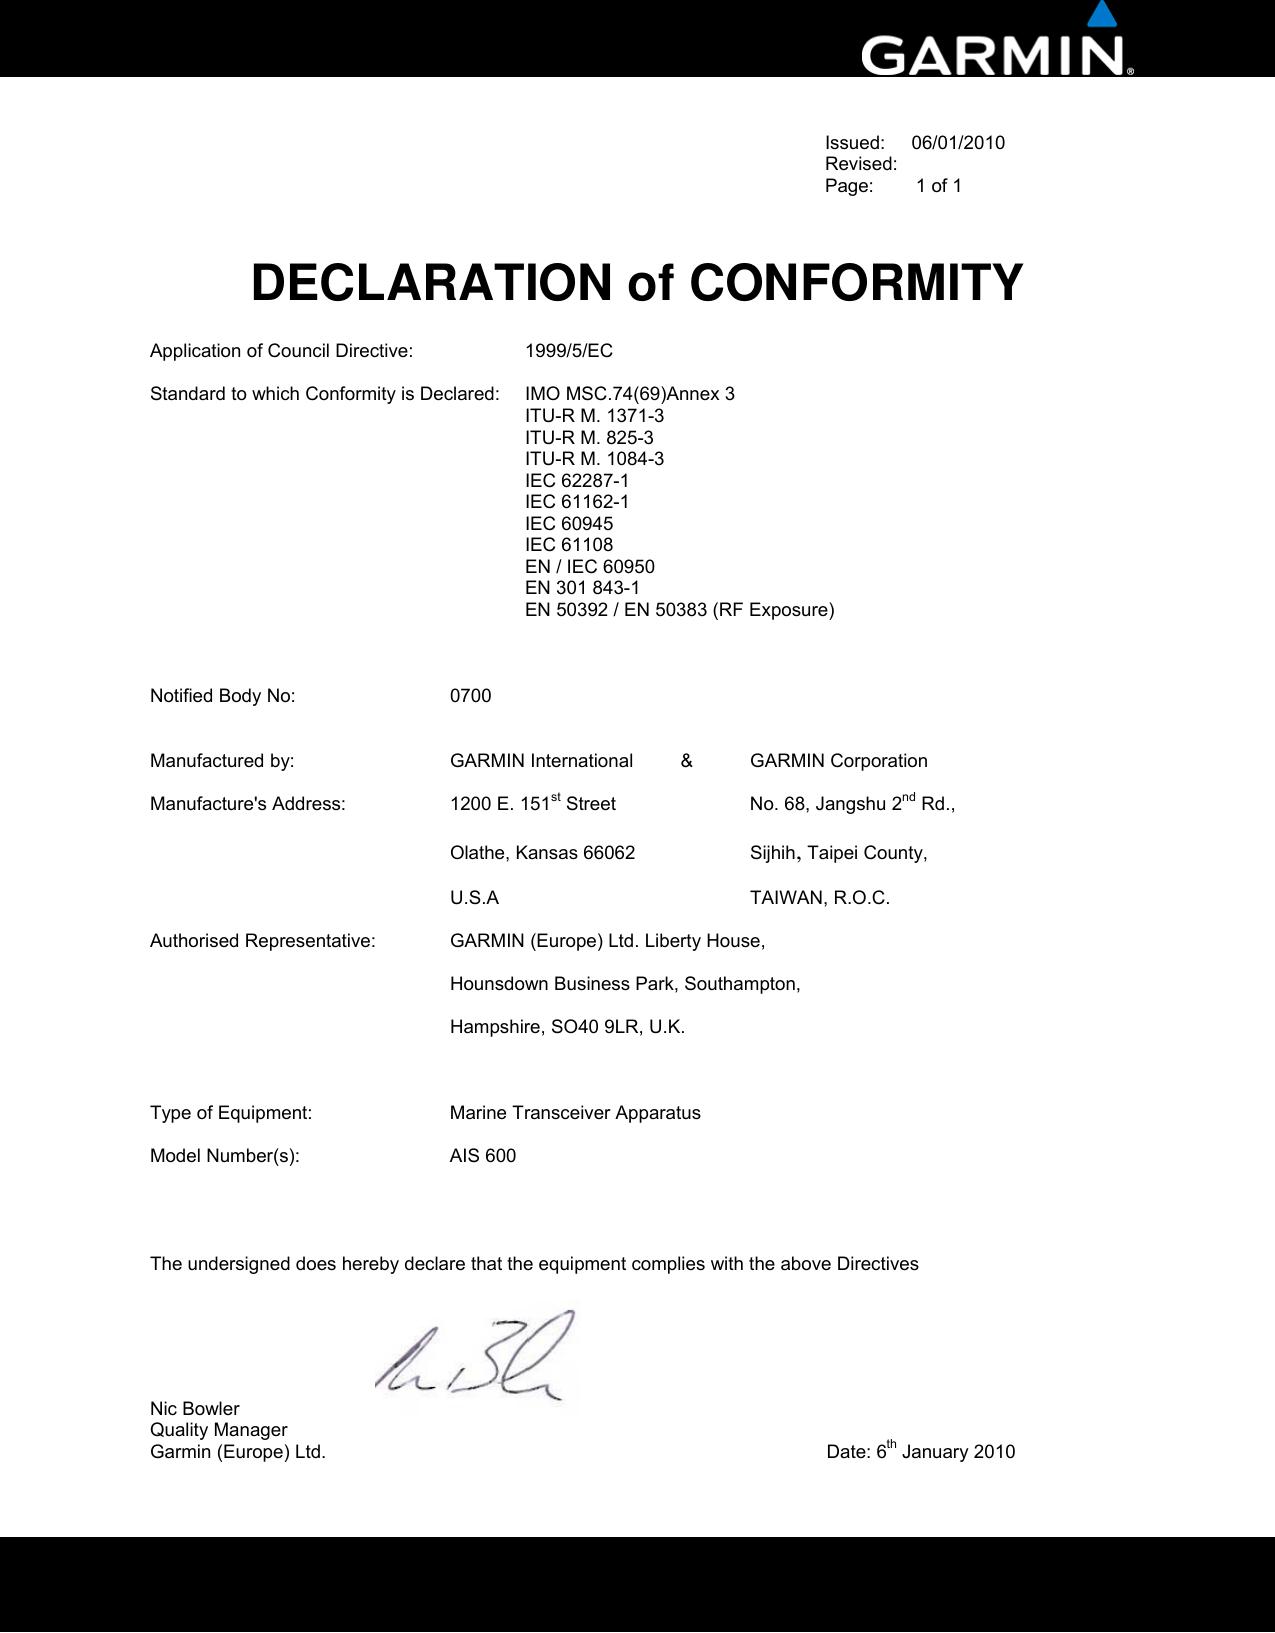 Garmin Ais 600 Blackbox Transceiver Declaration Of